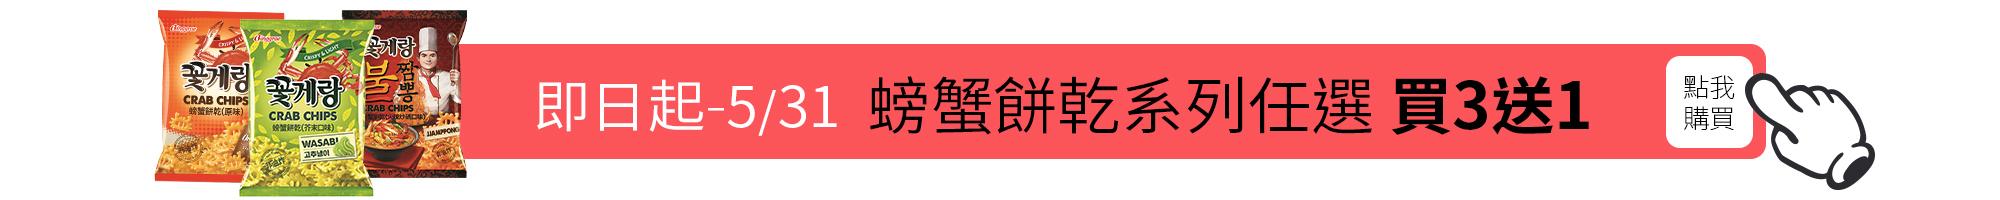 BKSHOP-螃蟹餅乾買3送1